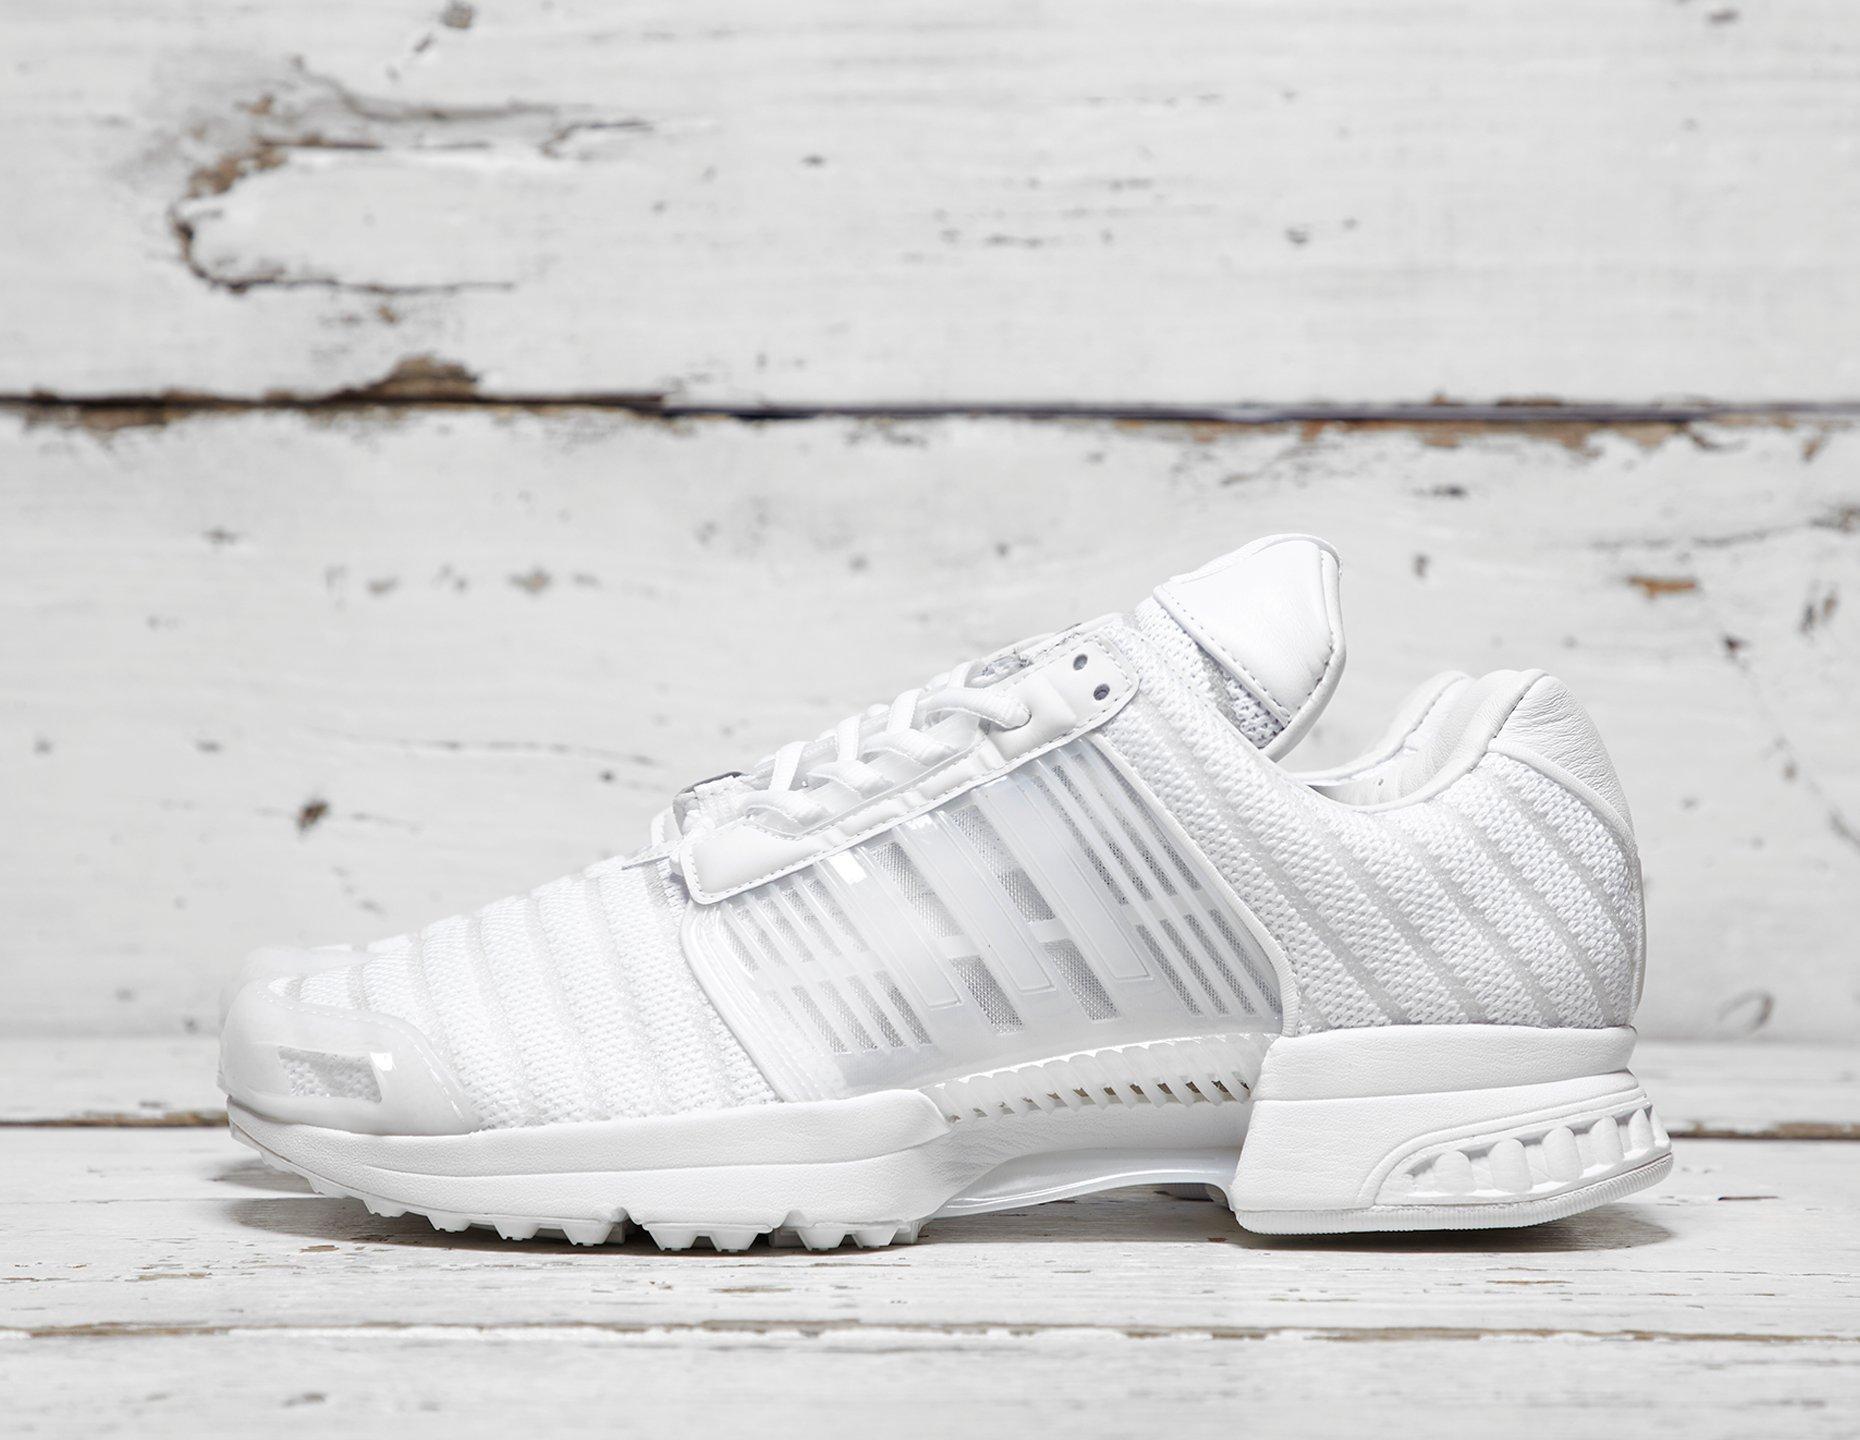 8139277ad Lyst - Adidas Originals X Sneakerboy X Wish X Sneaker Exchange ...